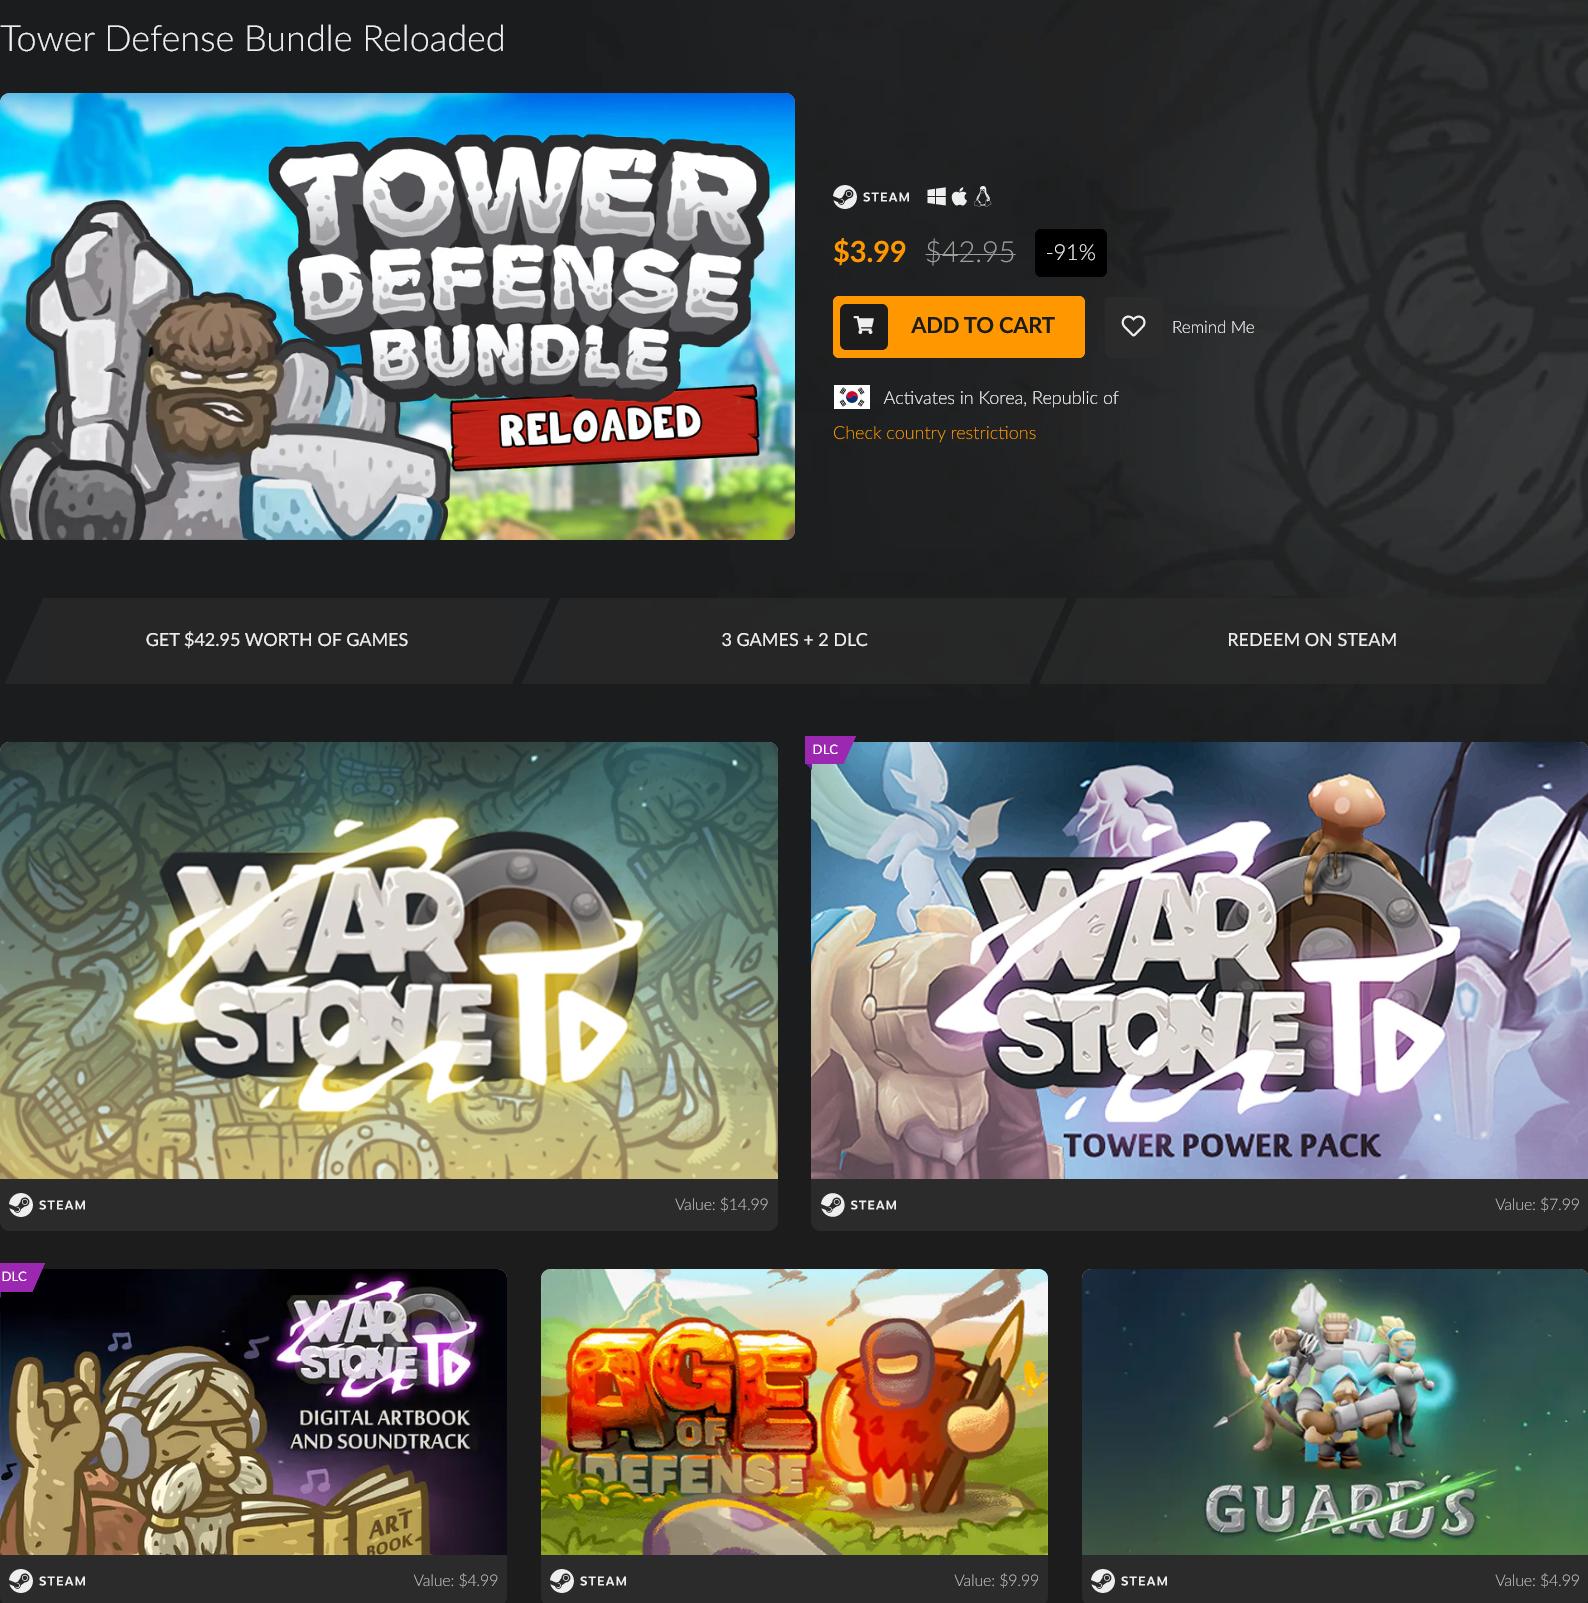 Screenshot_2021-04-13 Tower Defense Bundle Reloaded Steam Game Bundle Fanatical.png